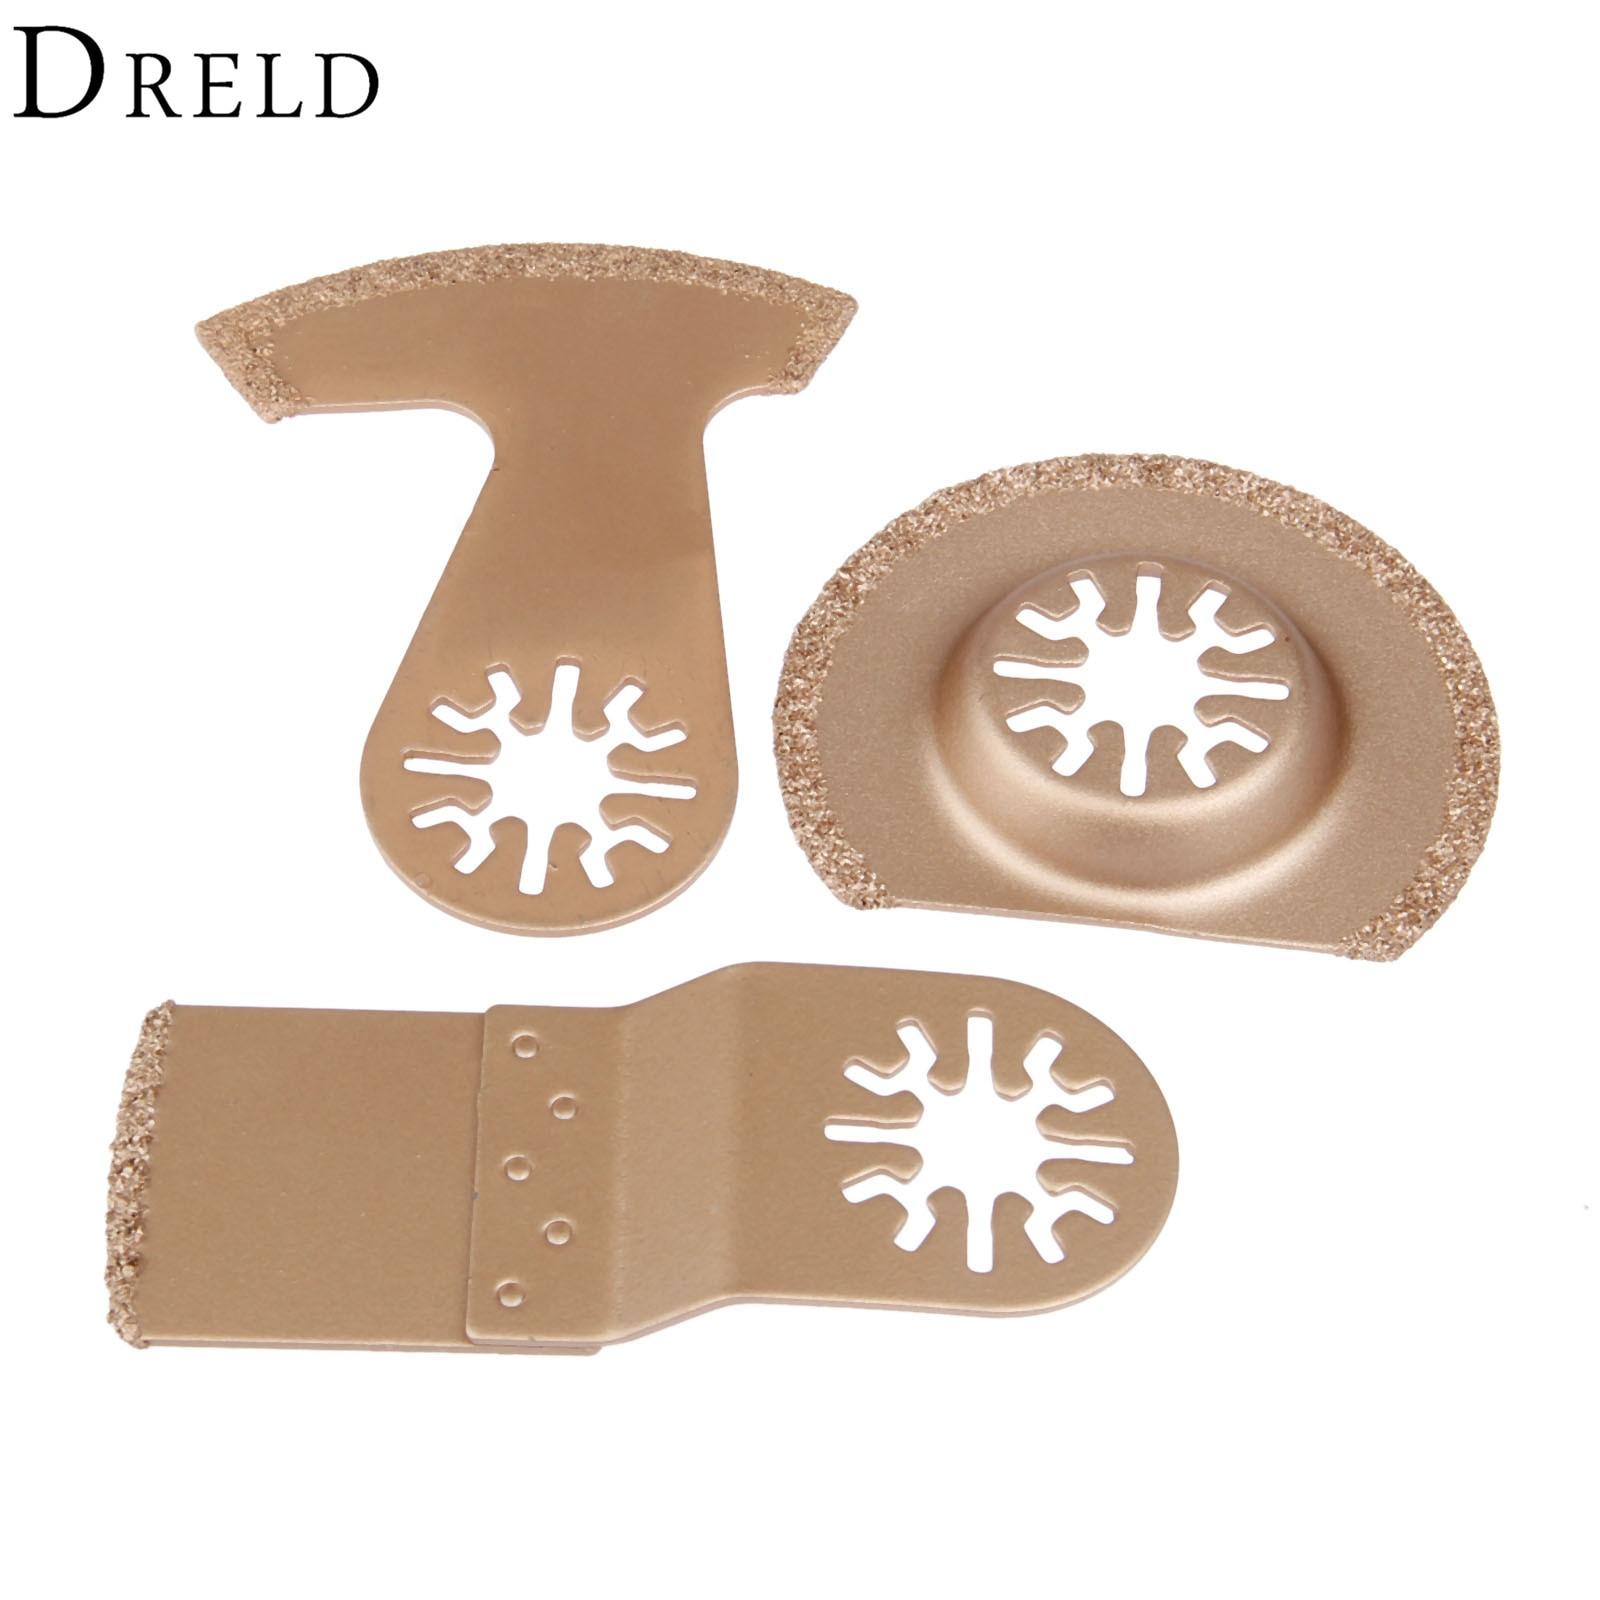 DRELD 3Pcs Oscillating Multi Tool Diamond Carbide Segment Saw Blade Multifunction For Multimaster Renovator Bosch Power Tools